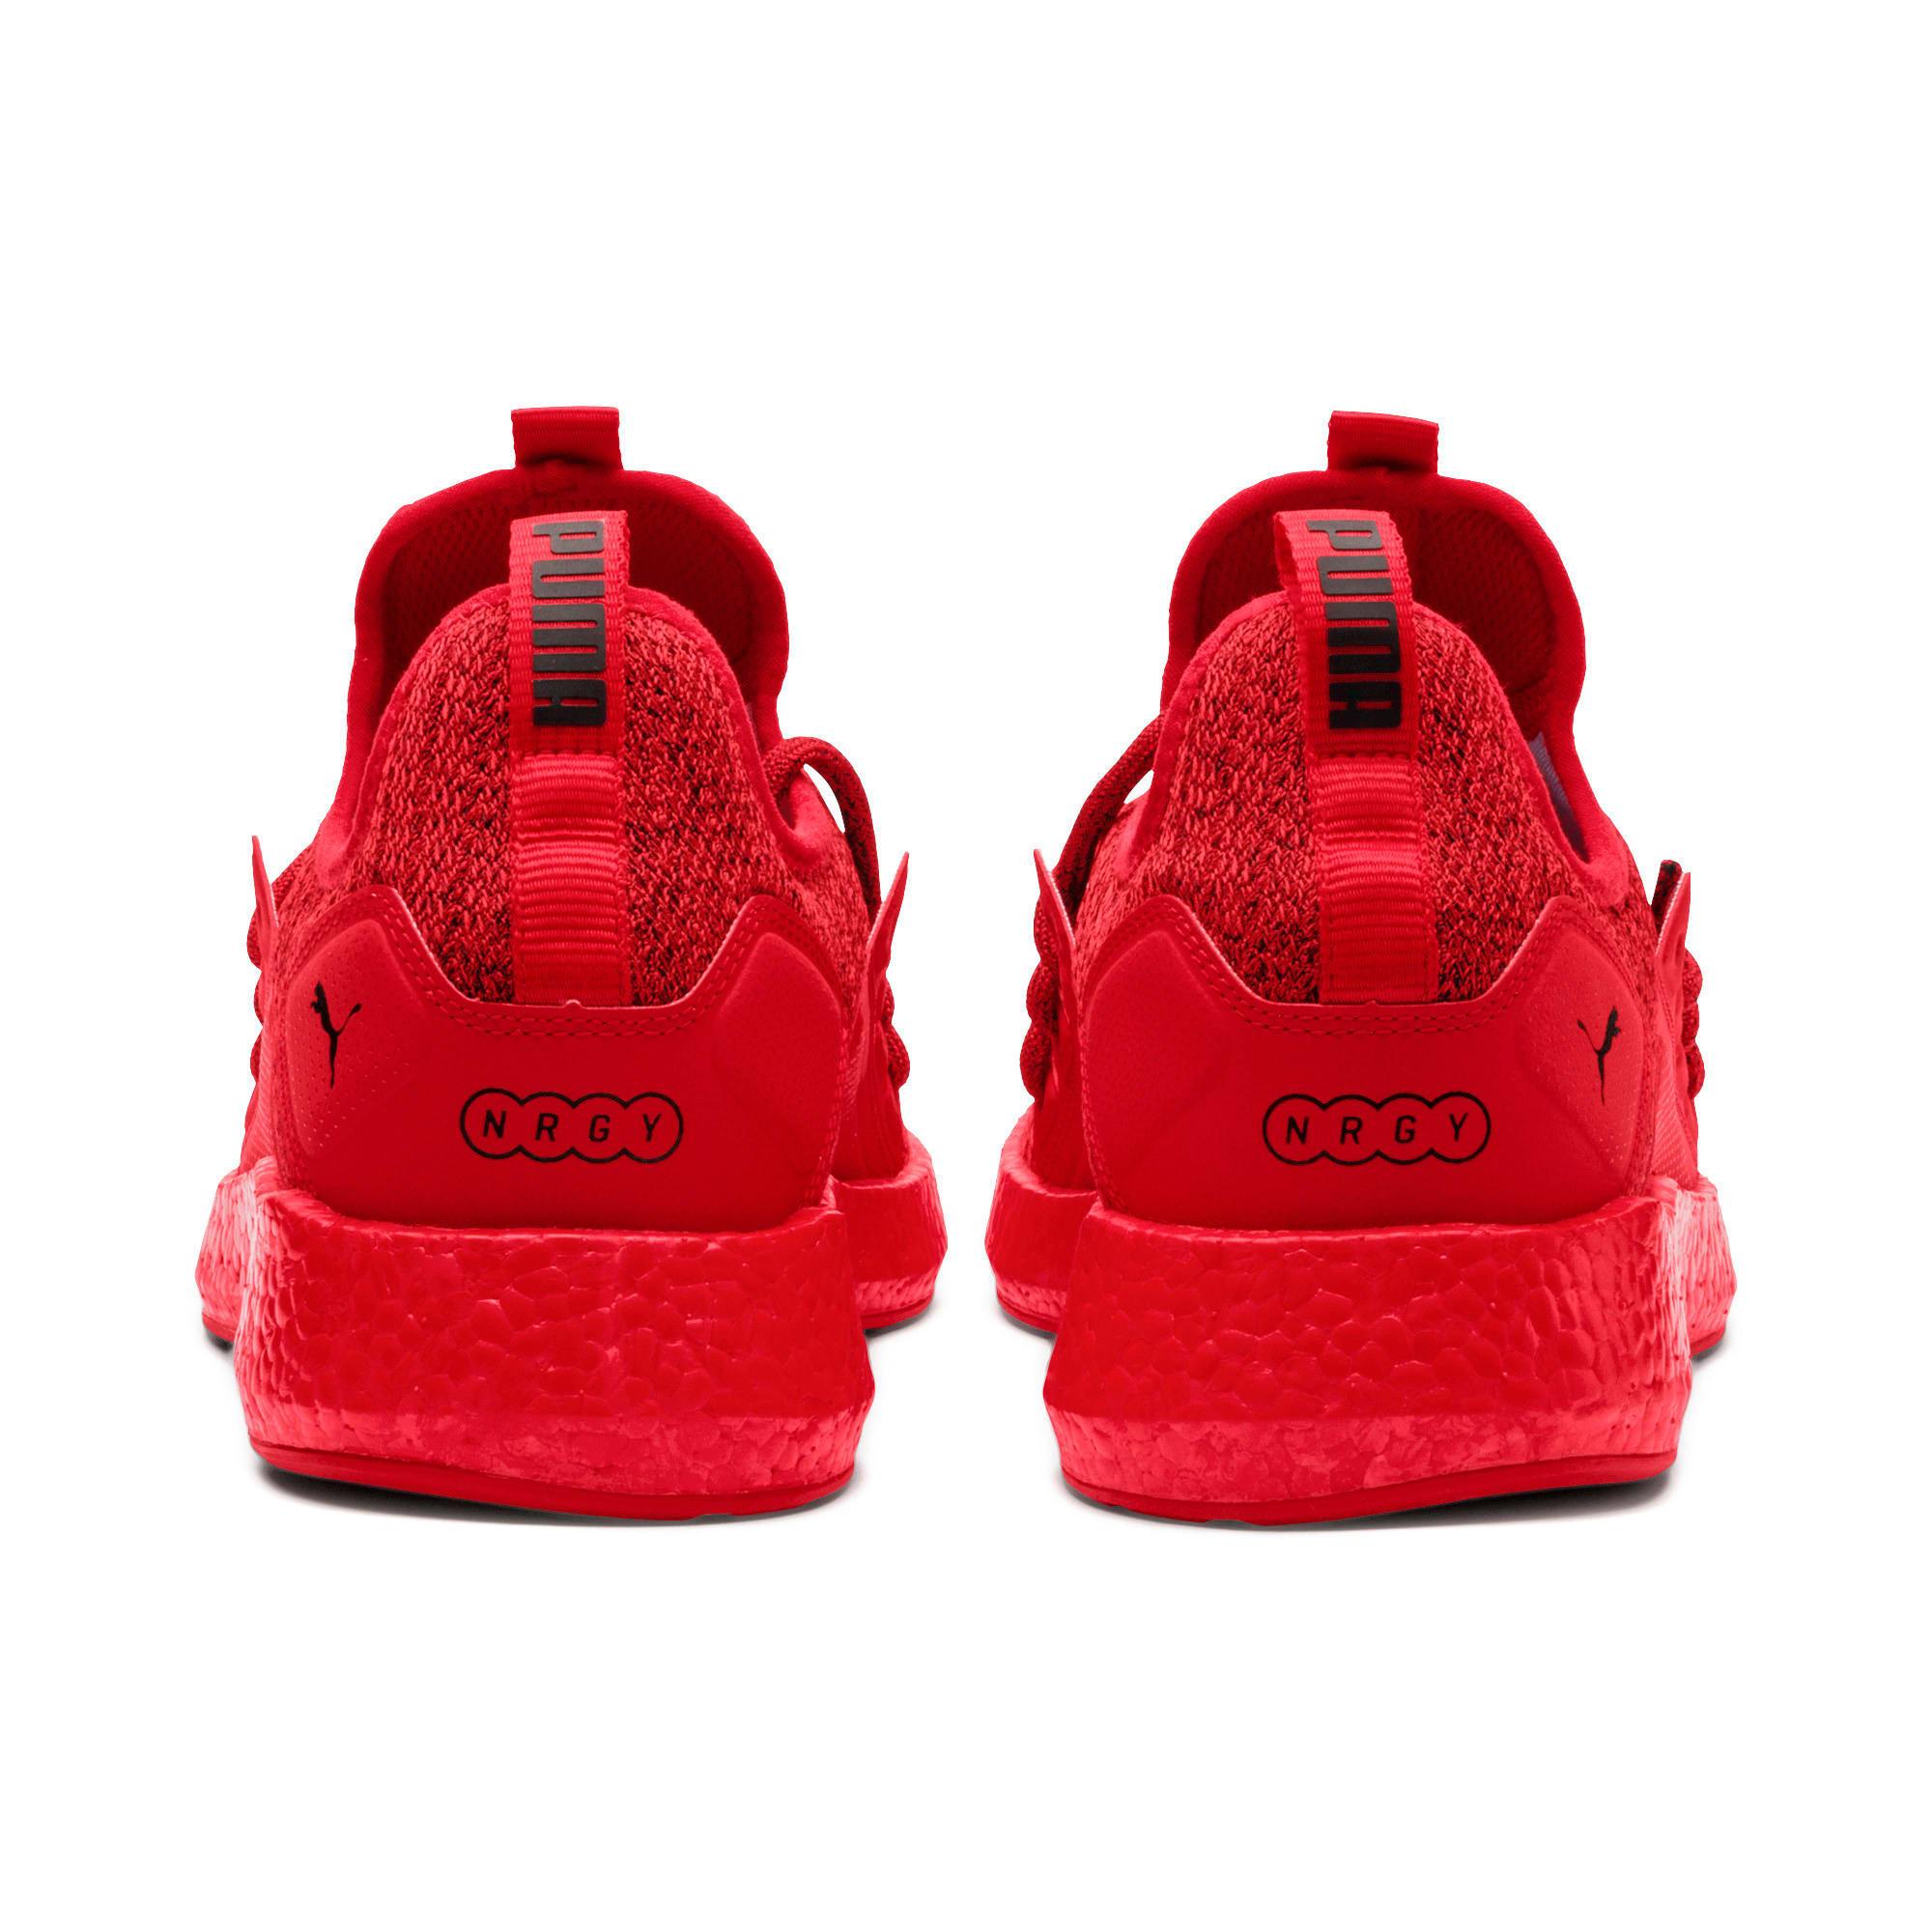 Thumbnail 4 of NRGY Neko Knit Men's Running Shoes, High Risk Red-Puma Black, medium